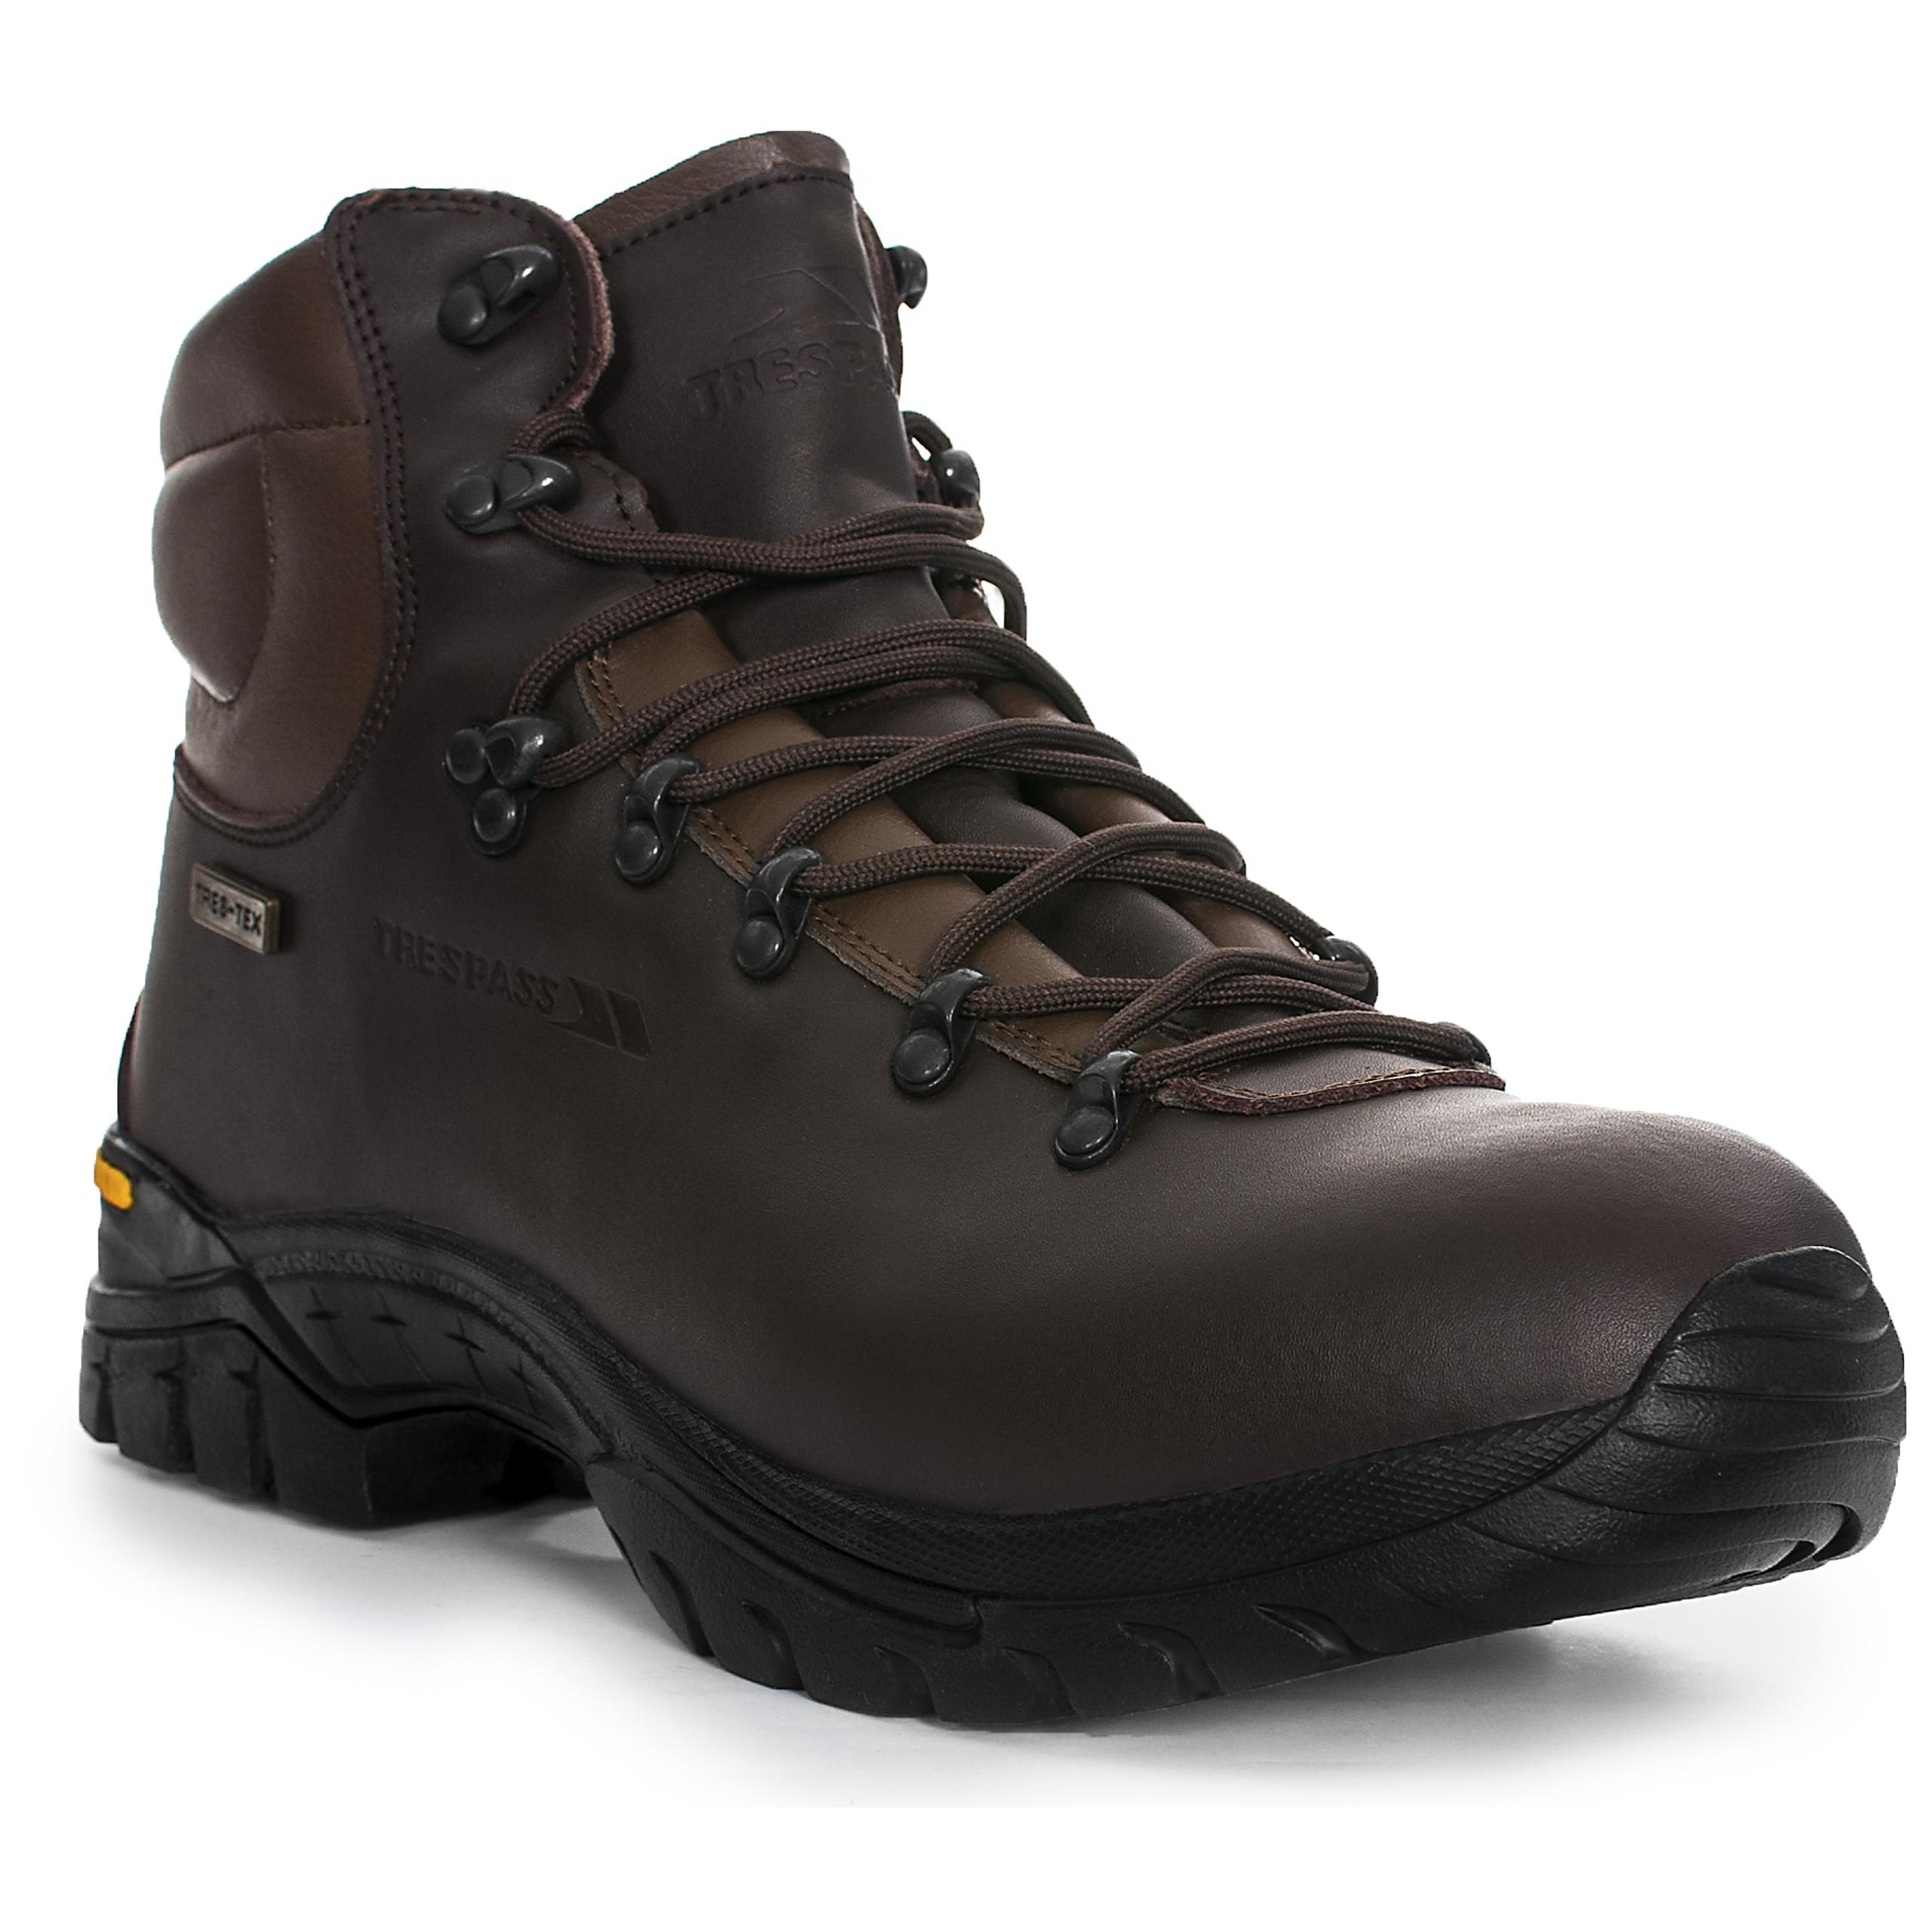 trespass walker mens waterproof walking hiking trail shoes